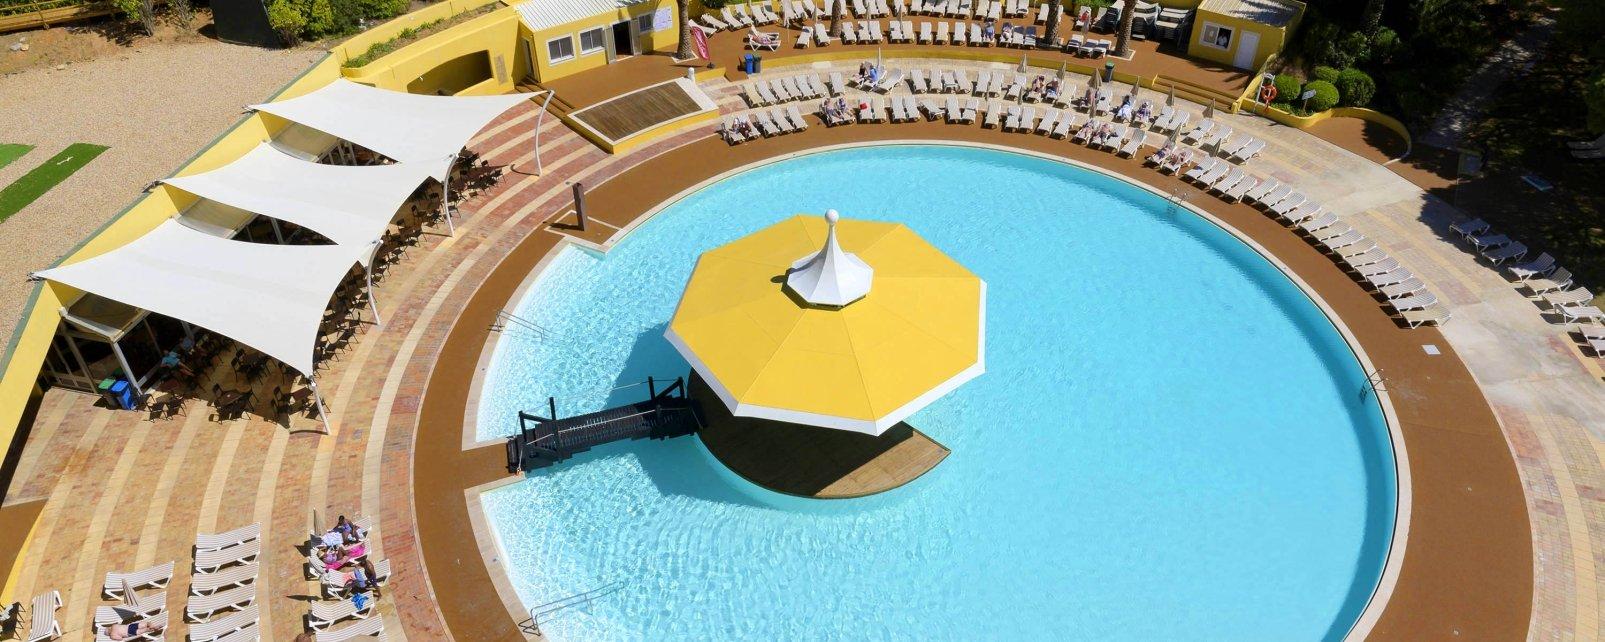 Hotels Algarve All Inclusive